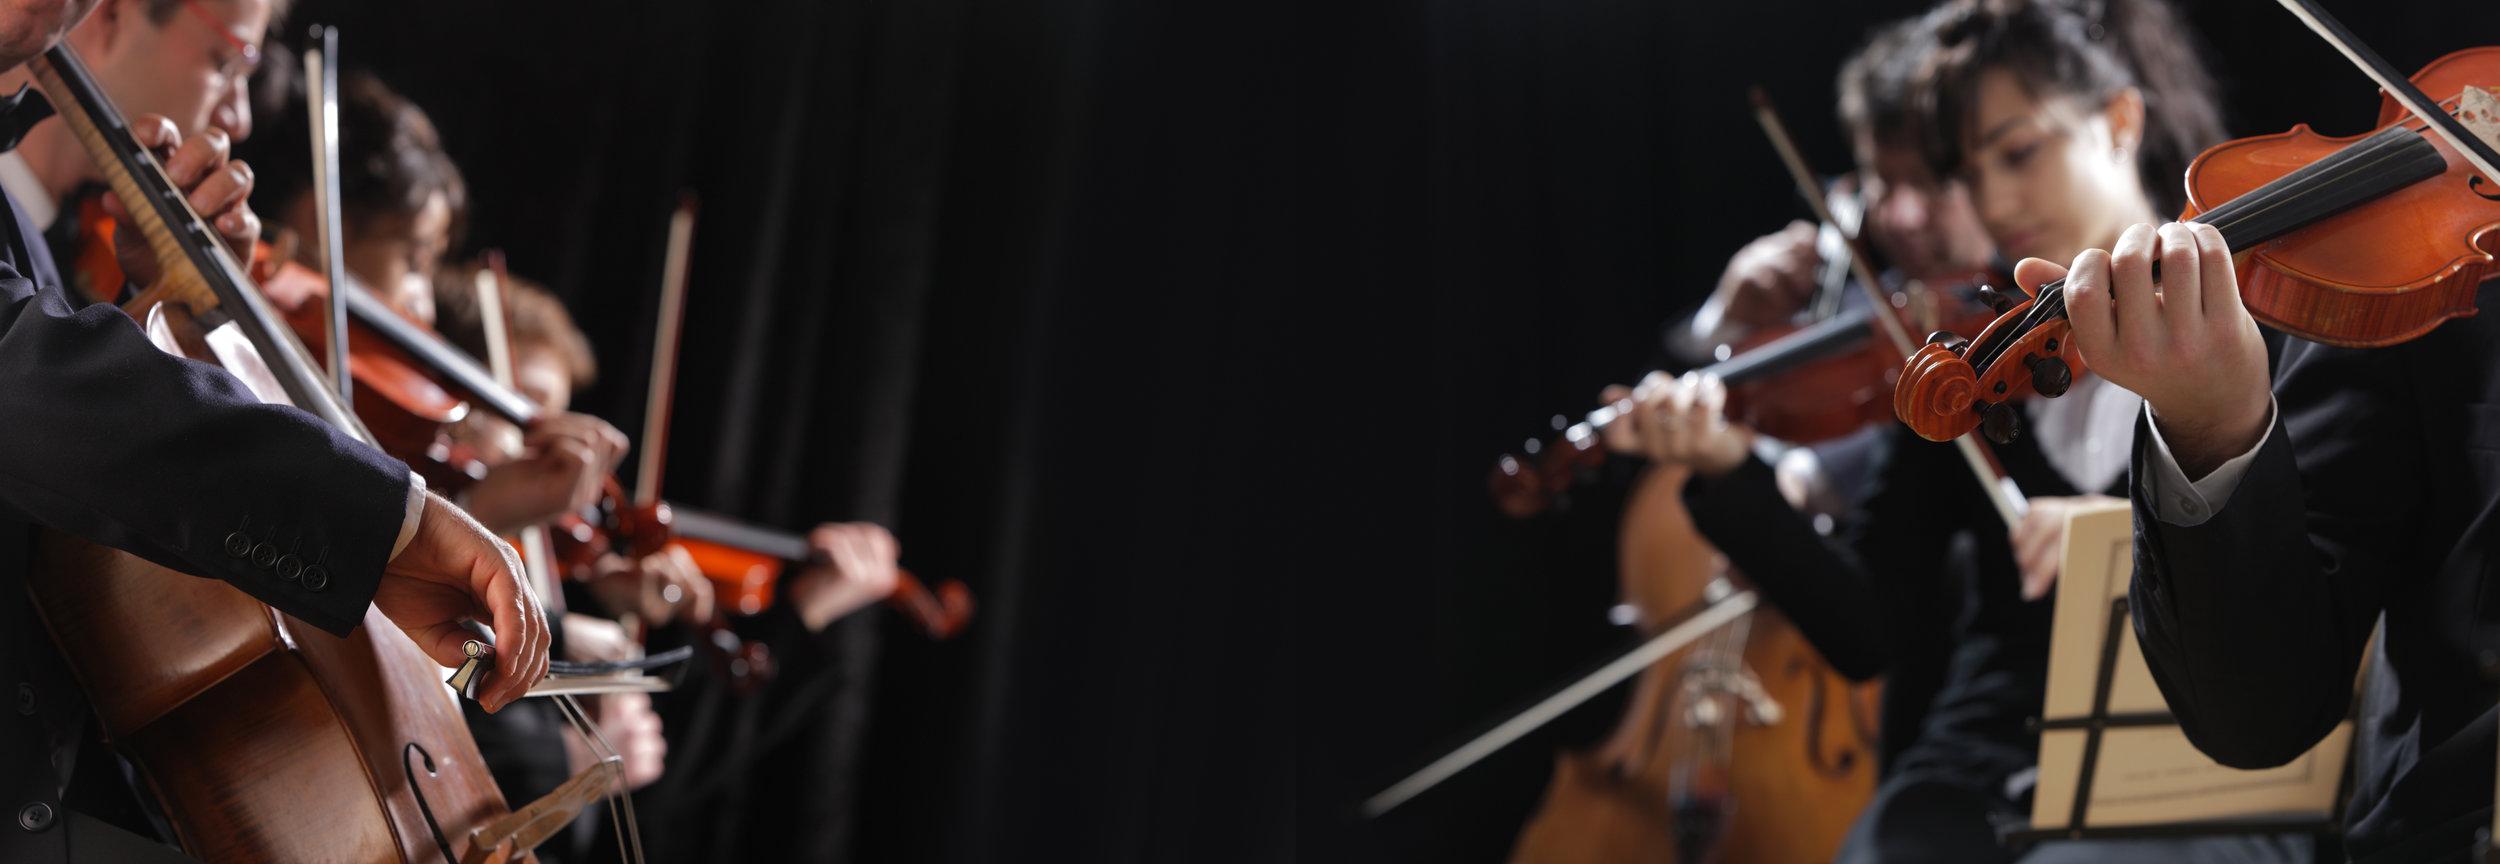 orchestra-violini.jpeg